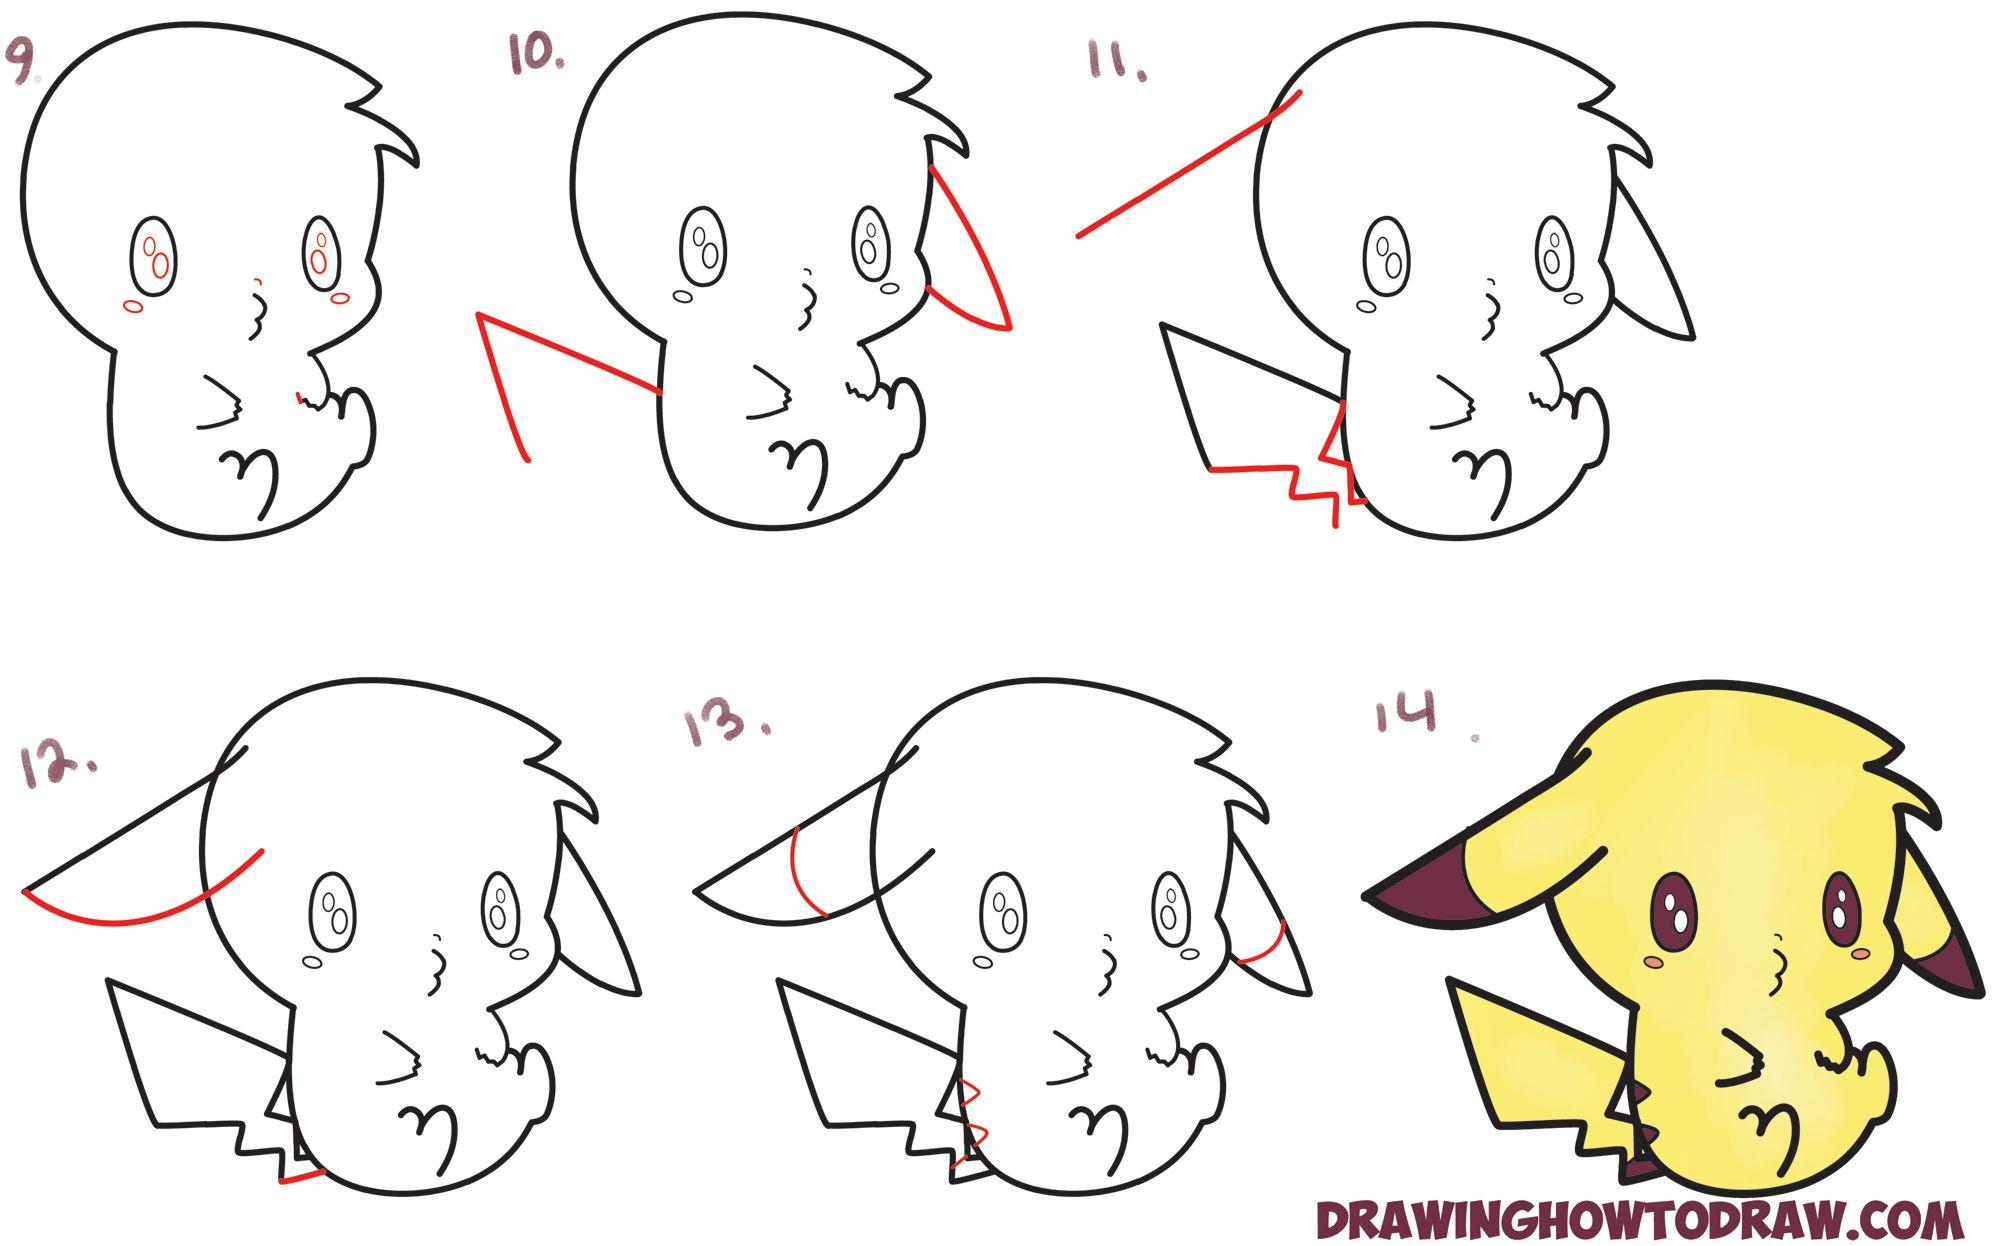 Learn how to draw an adorable pikachu kawaii chibi